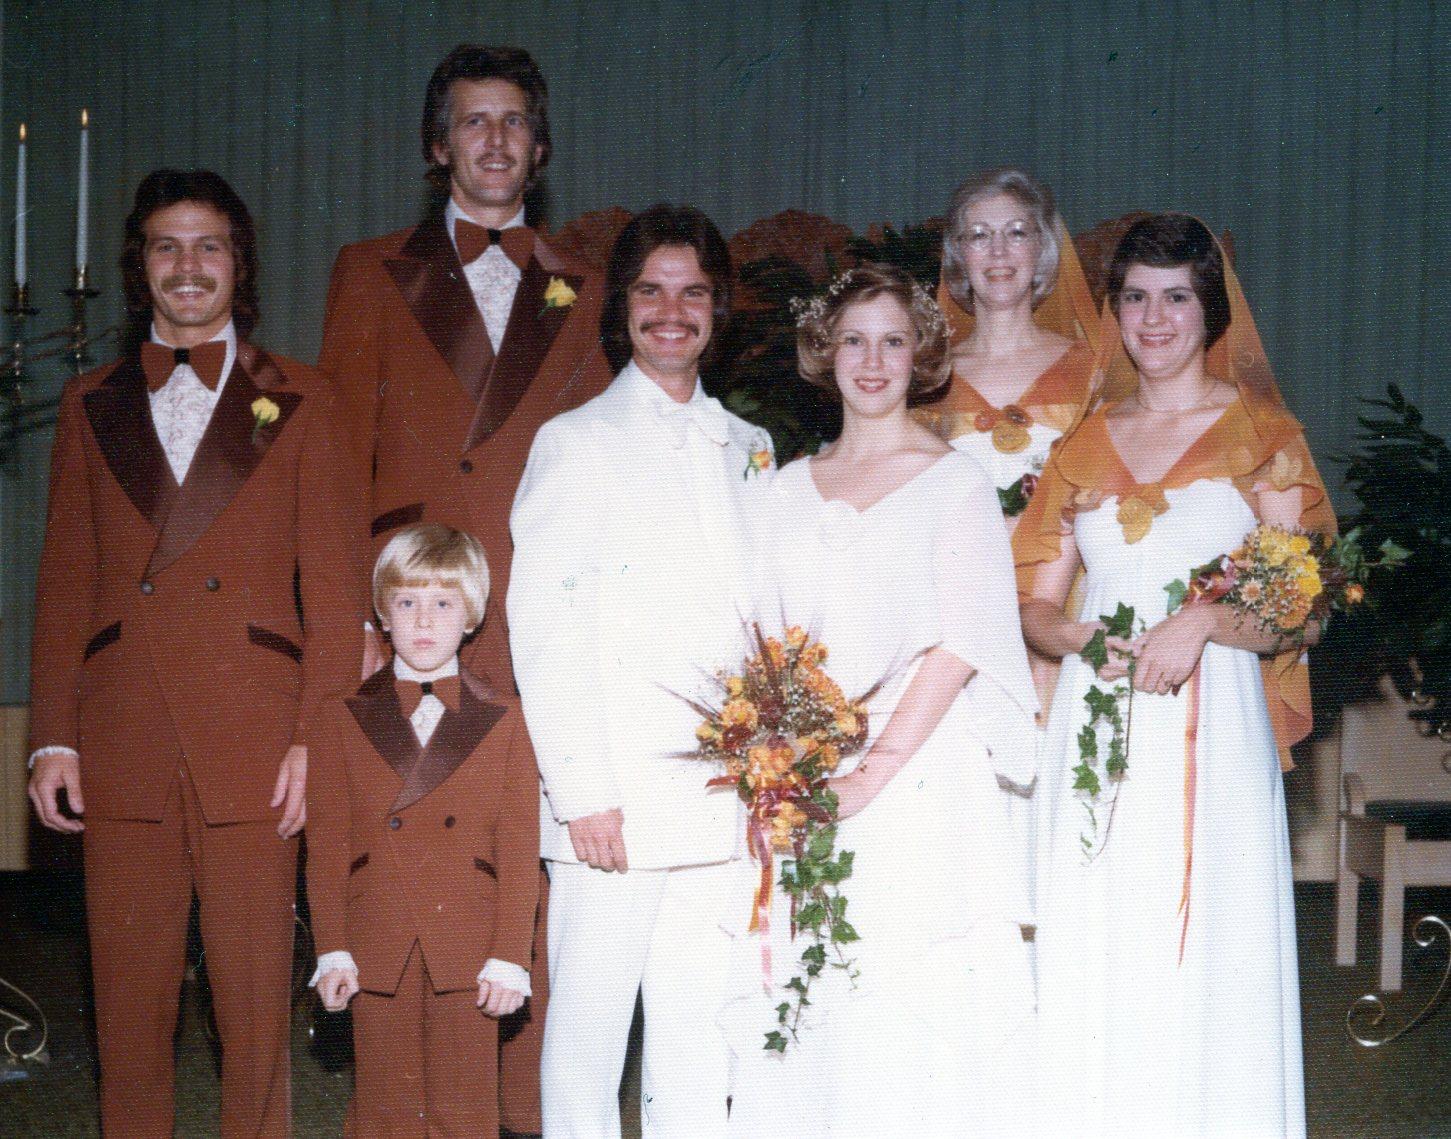 Russ Taff & Tori Taff wedding photo